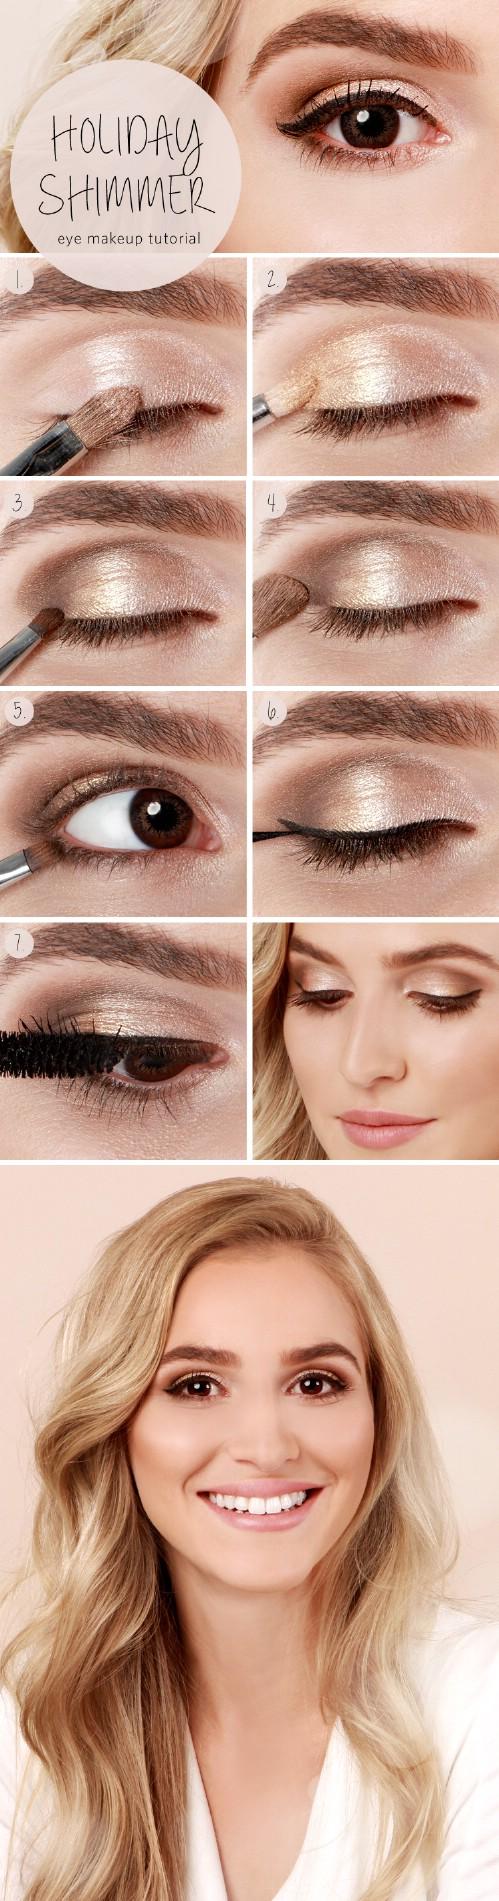 Subtle Shimmer - 10 Stylishly FestiveChristmas Makeup Ideas